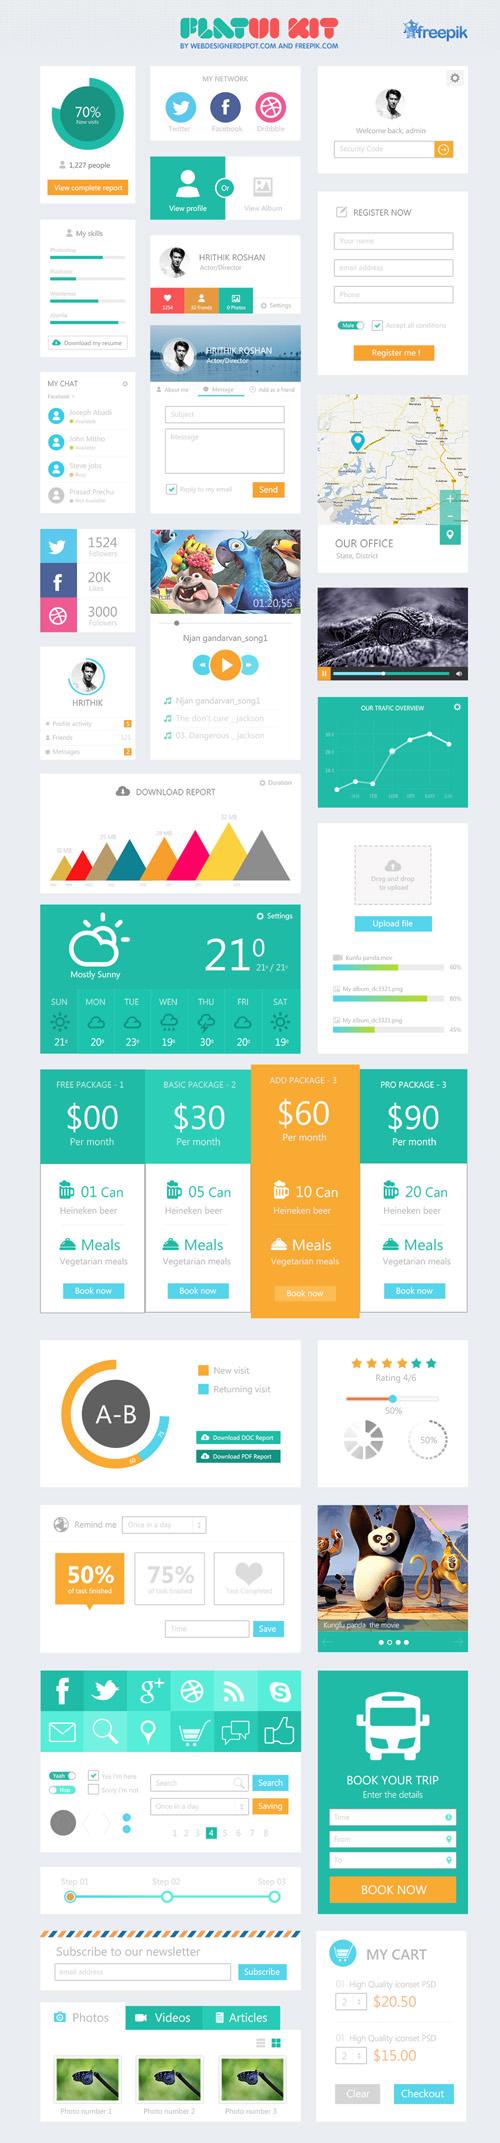 Flat Elements for Web UI Design-40